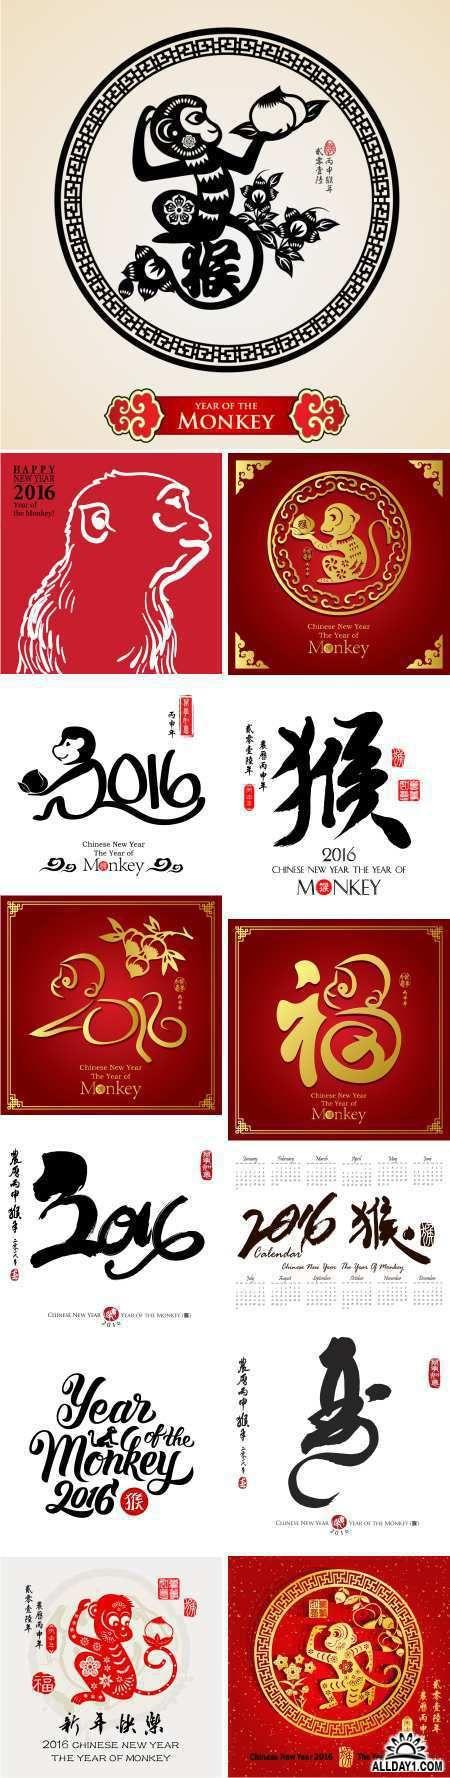 Chinese zodiac monkey. 2016 year of the monkey - 2, 25xEPS